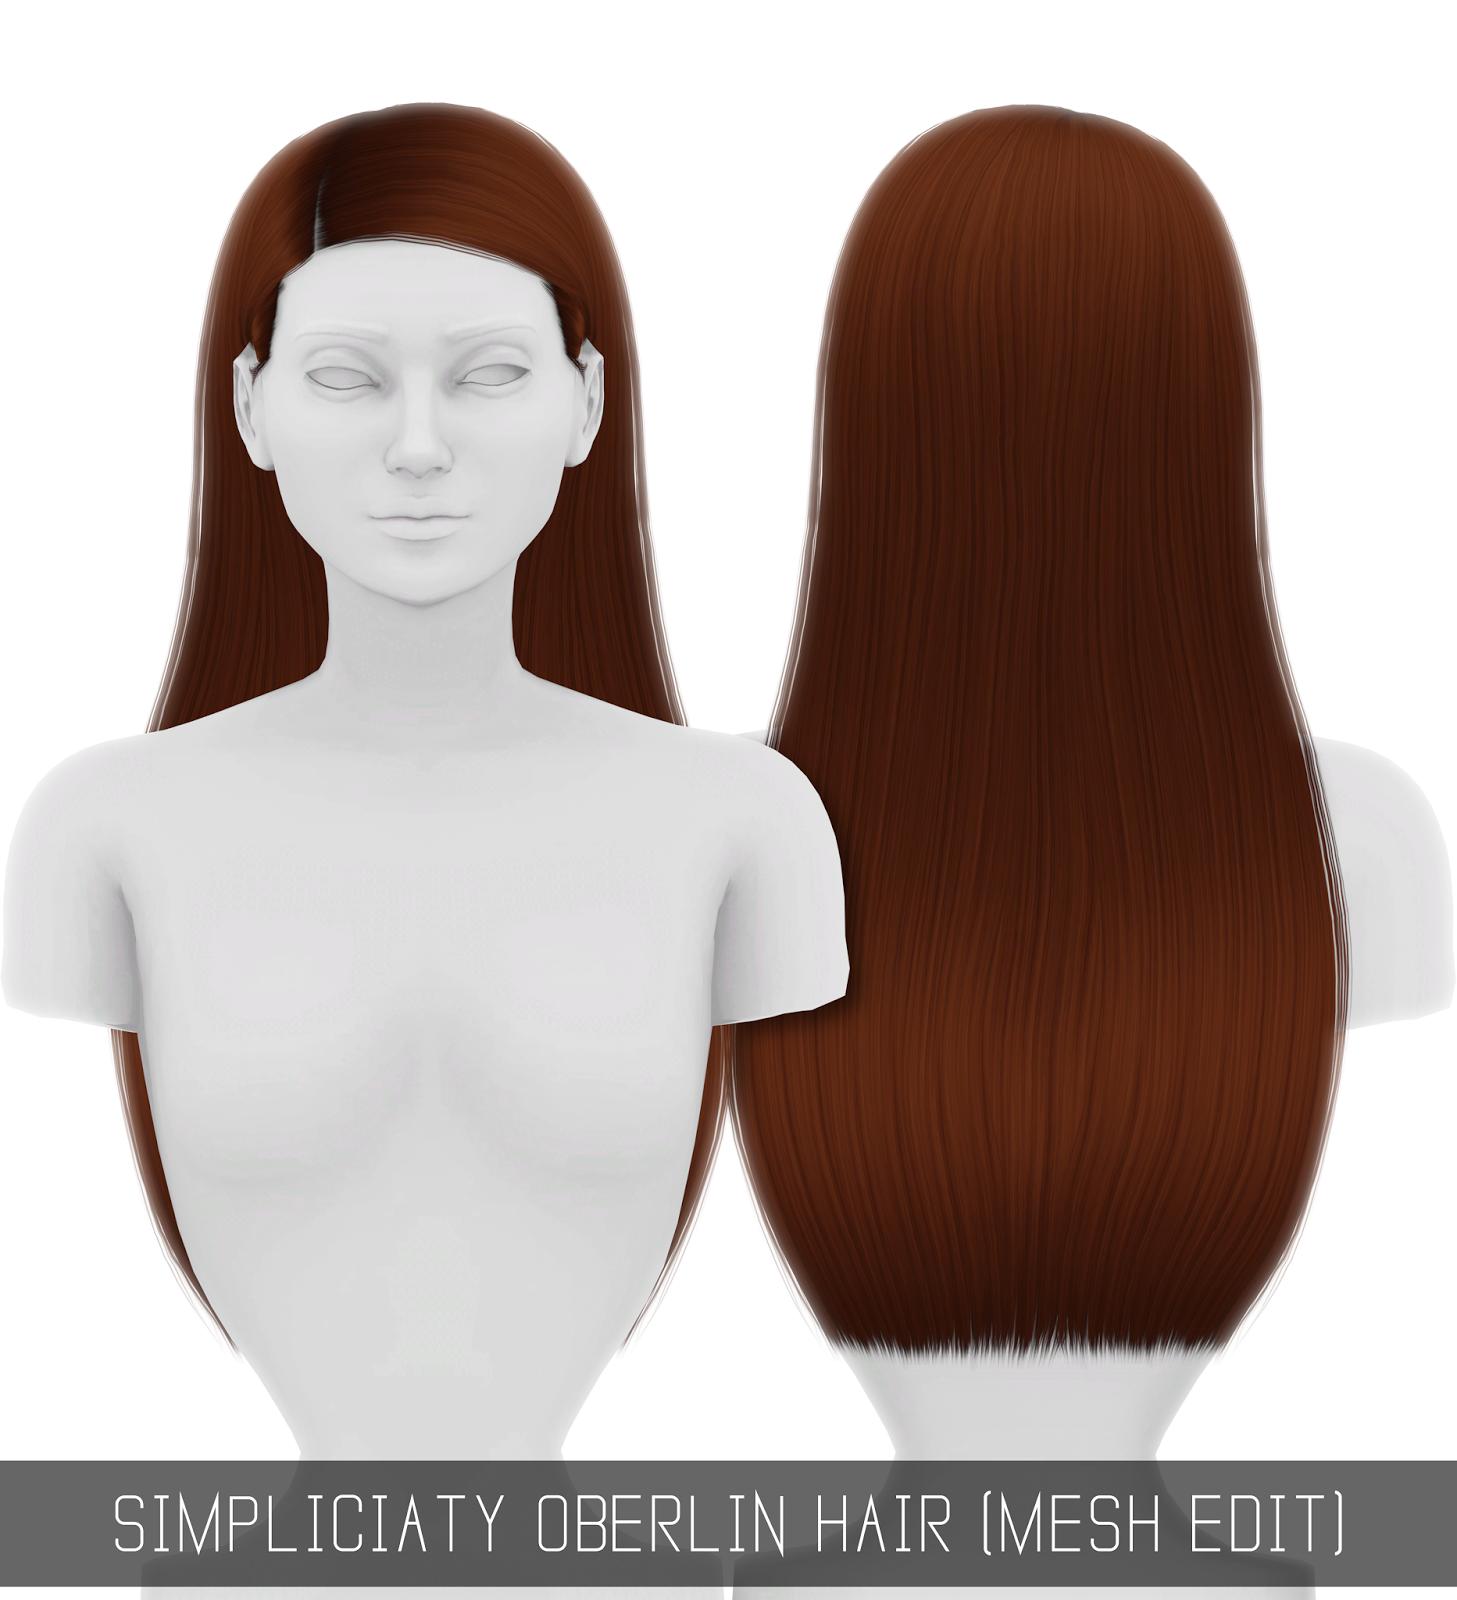 Oberlin Hair Mesh Edit Simpliciaty